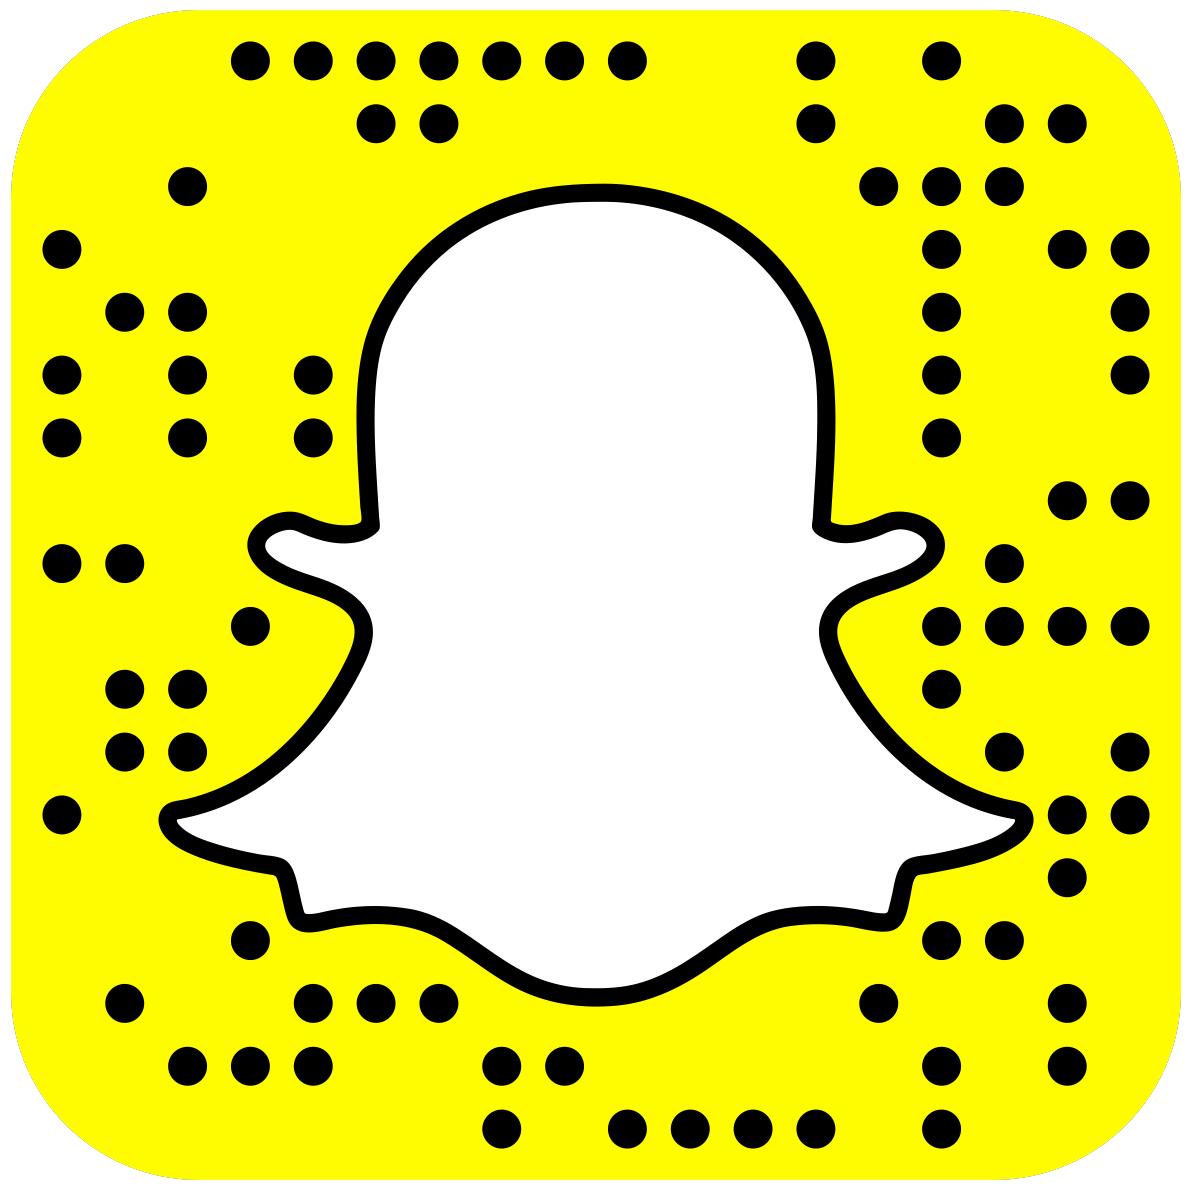 Haylie Duff Snapchat username